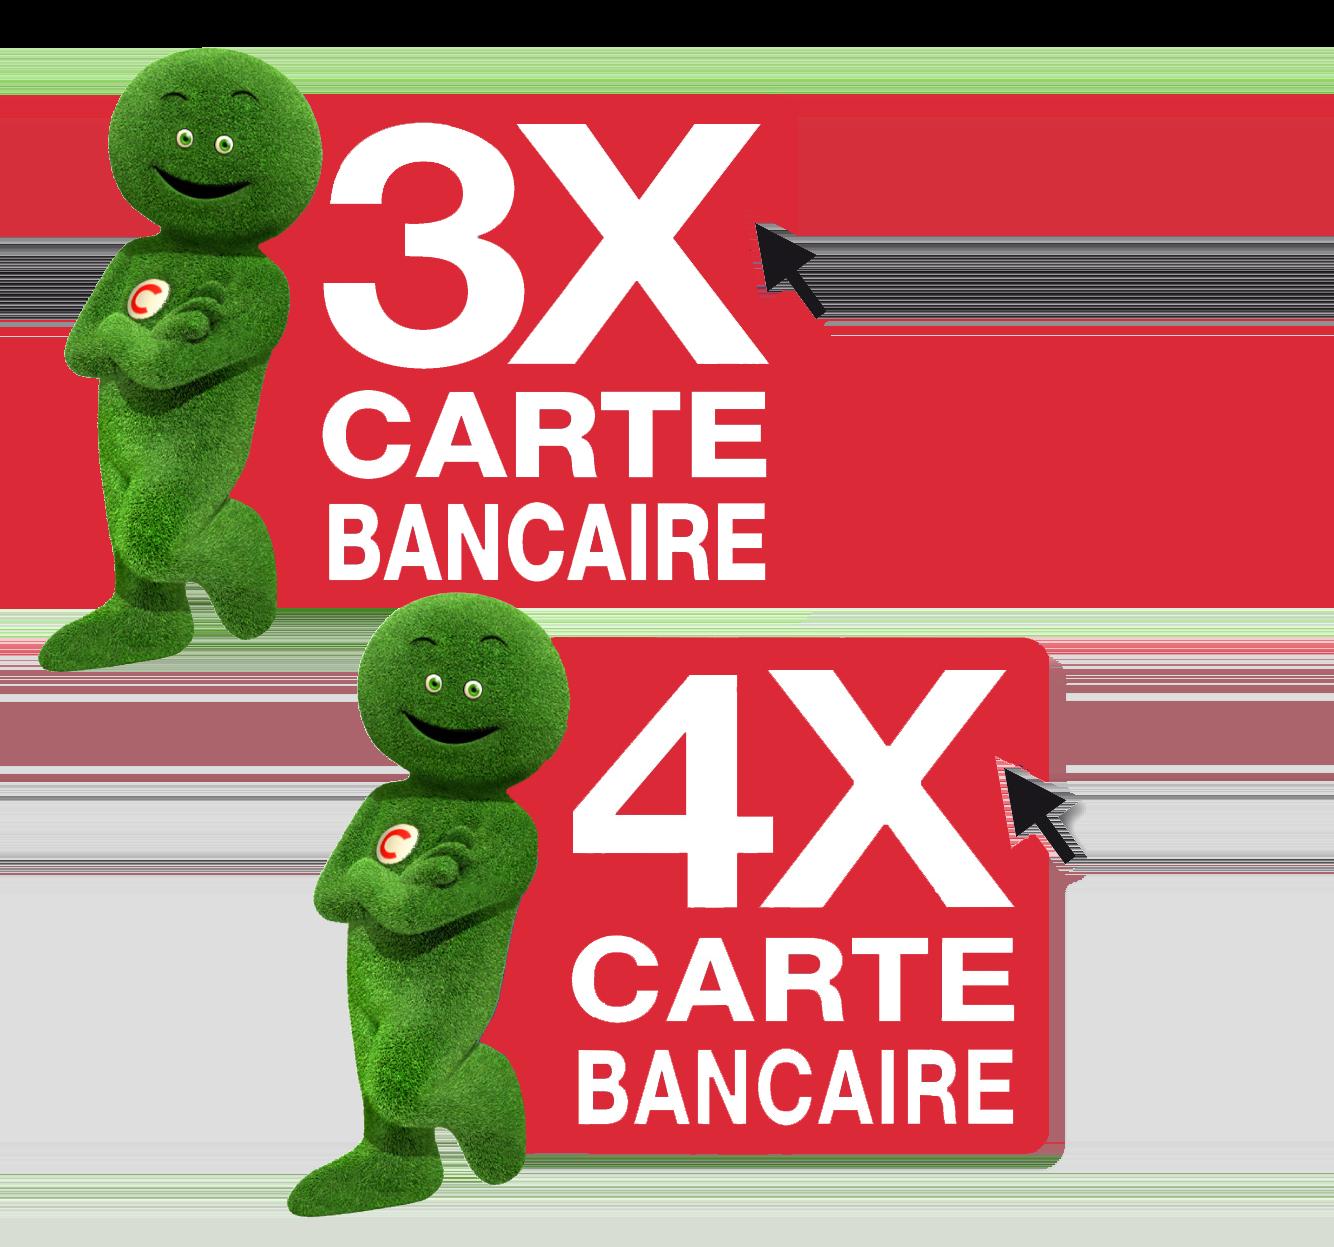 3x 4x logo.png